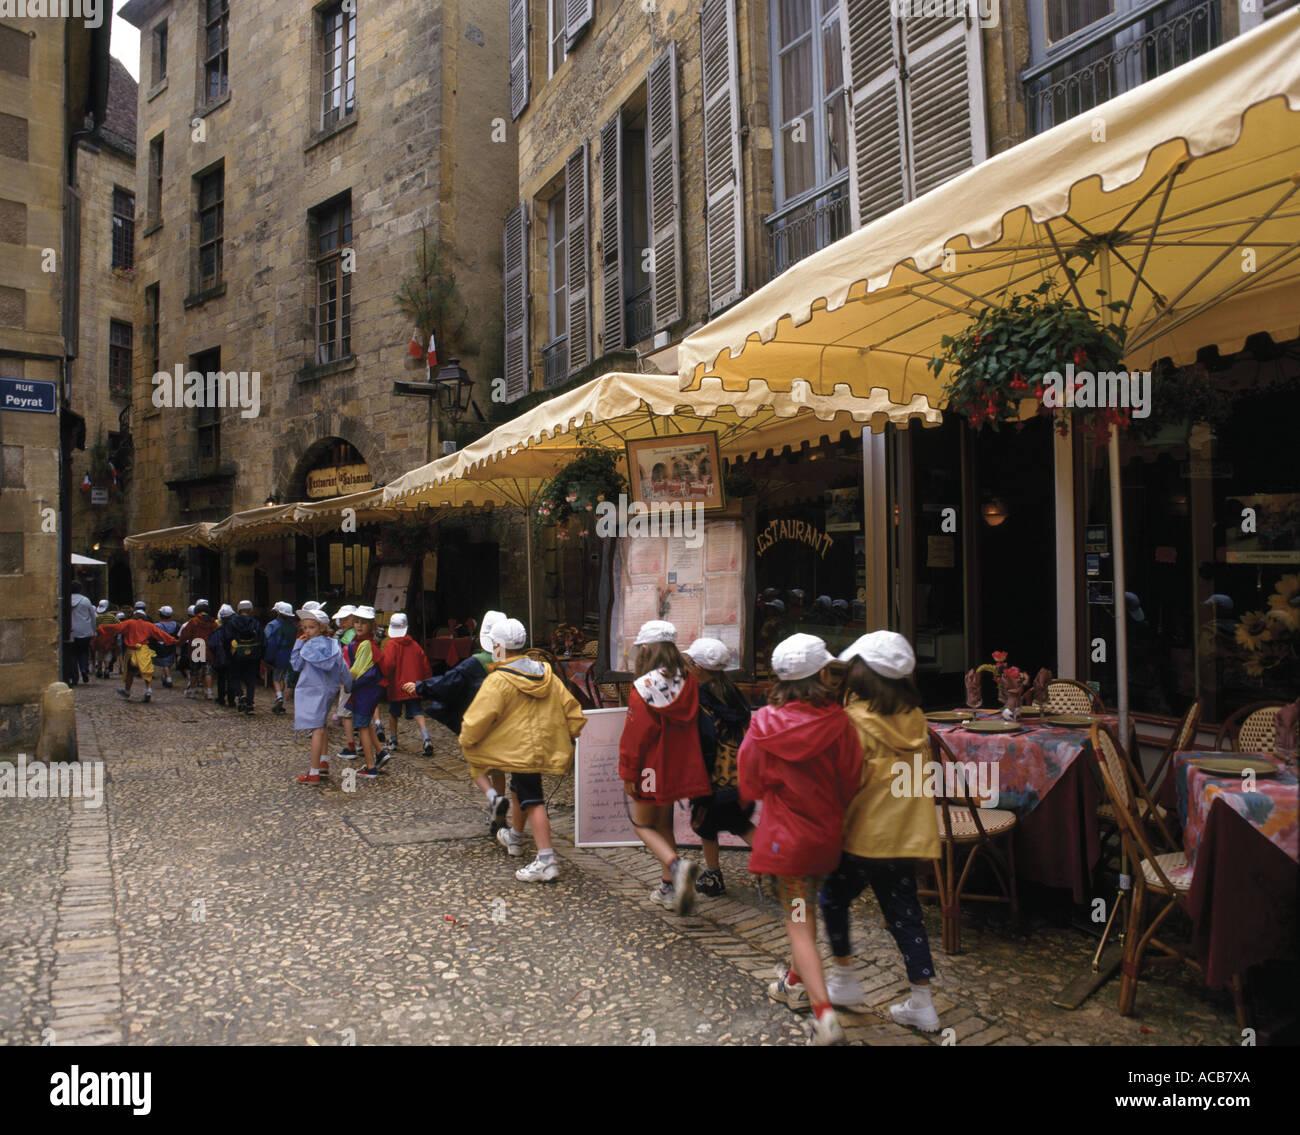 Sarlat-la-Caneda schoolchildren,Dordogne,France,Europe - Stock Image